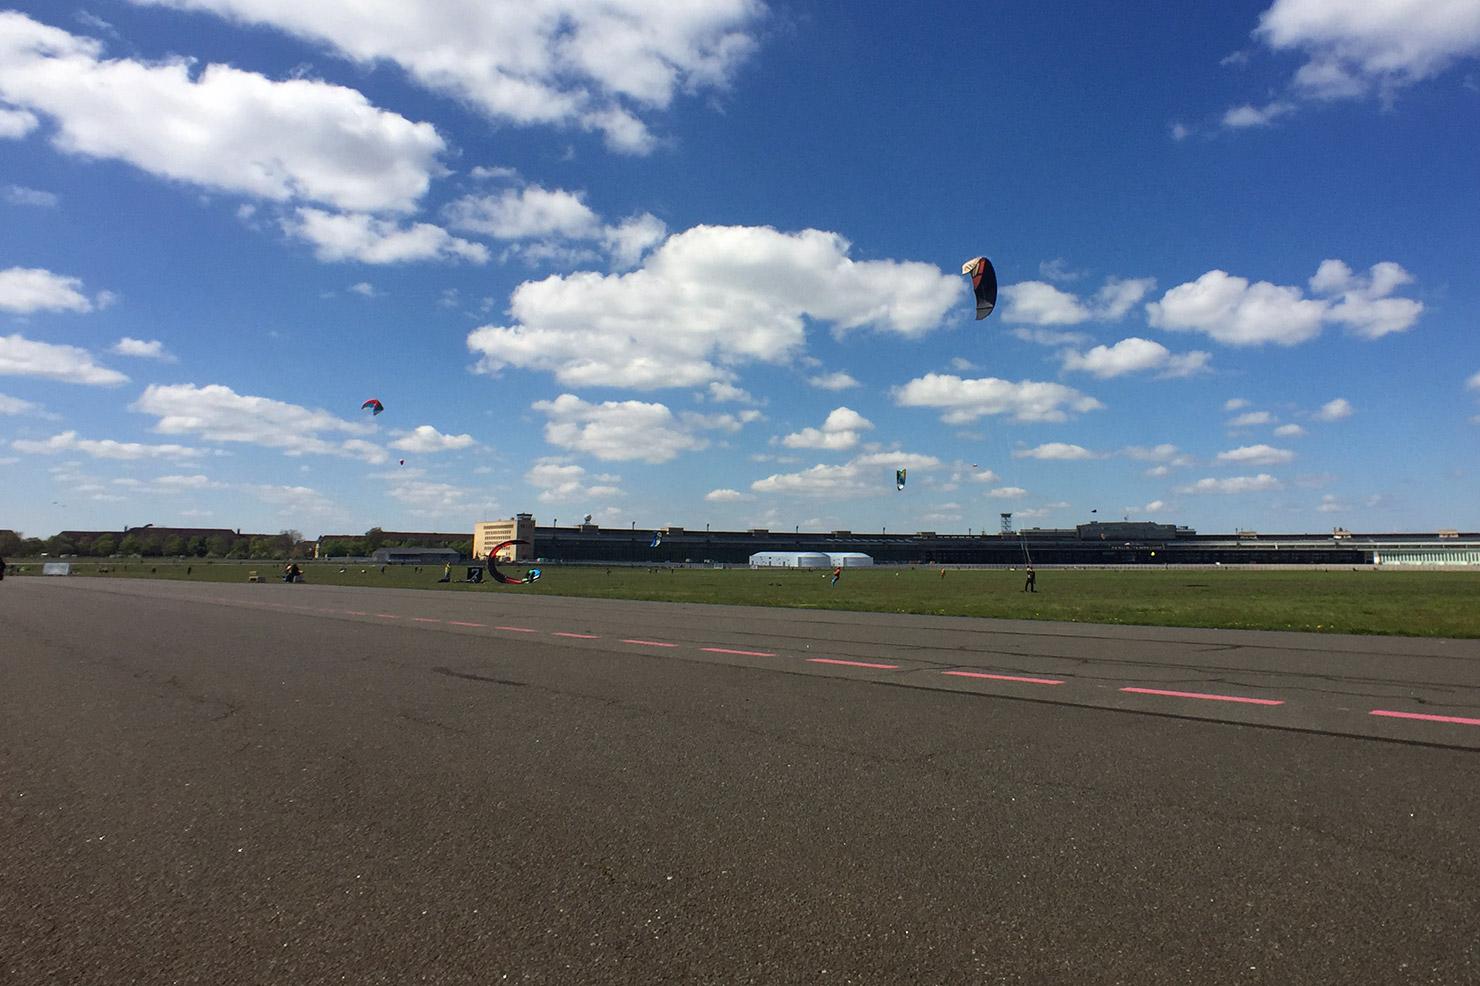 Tempelhofer Feld: parade-ground, airport, spandex leisure resort